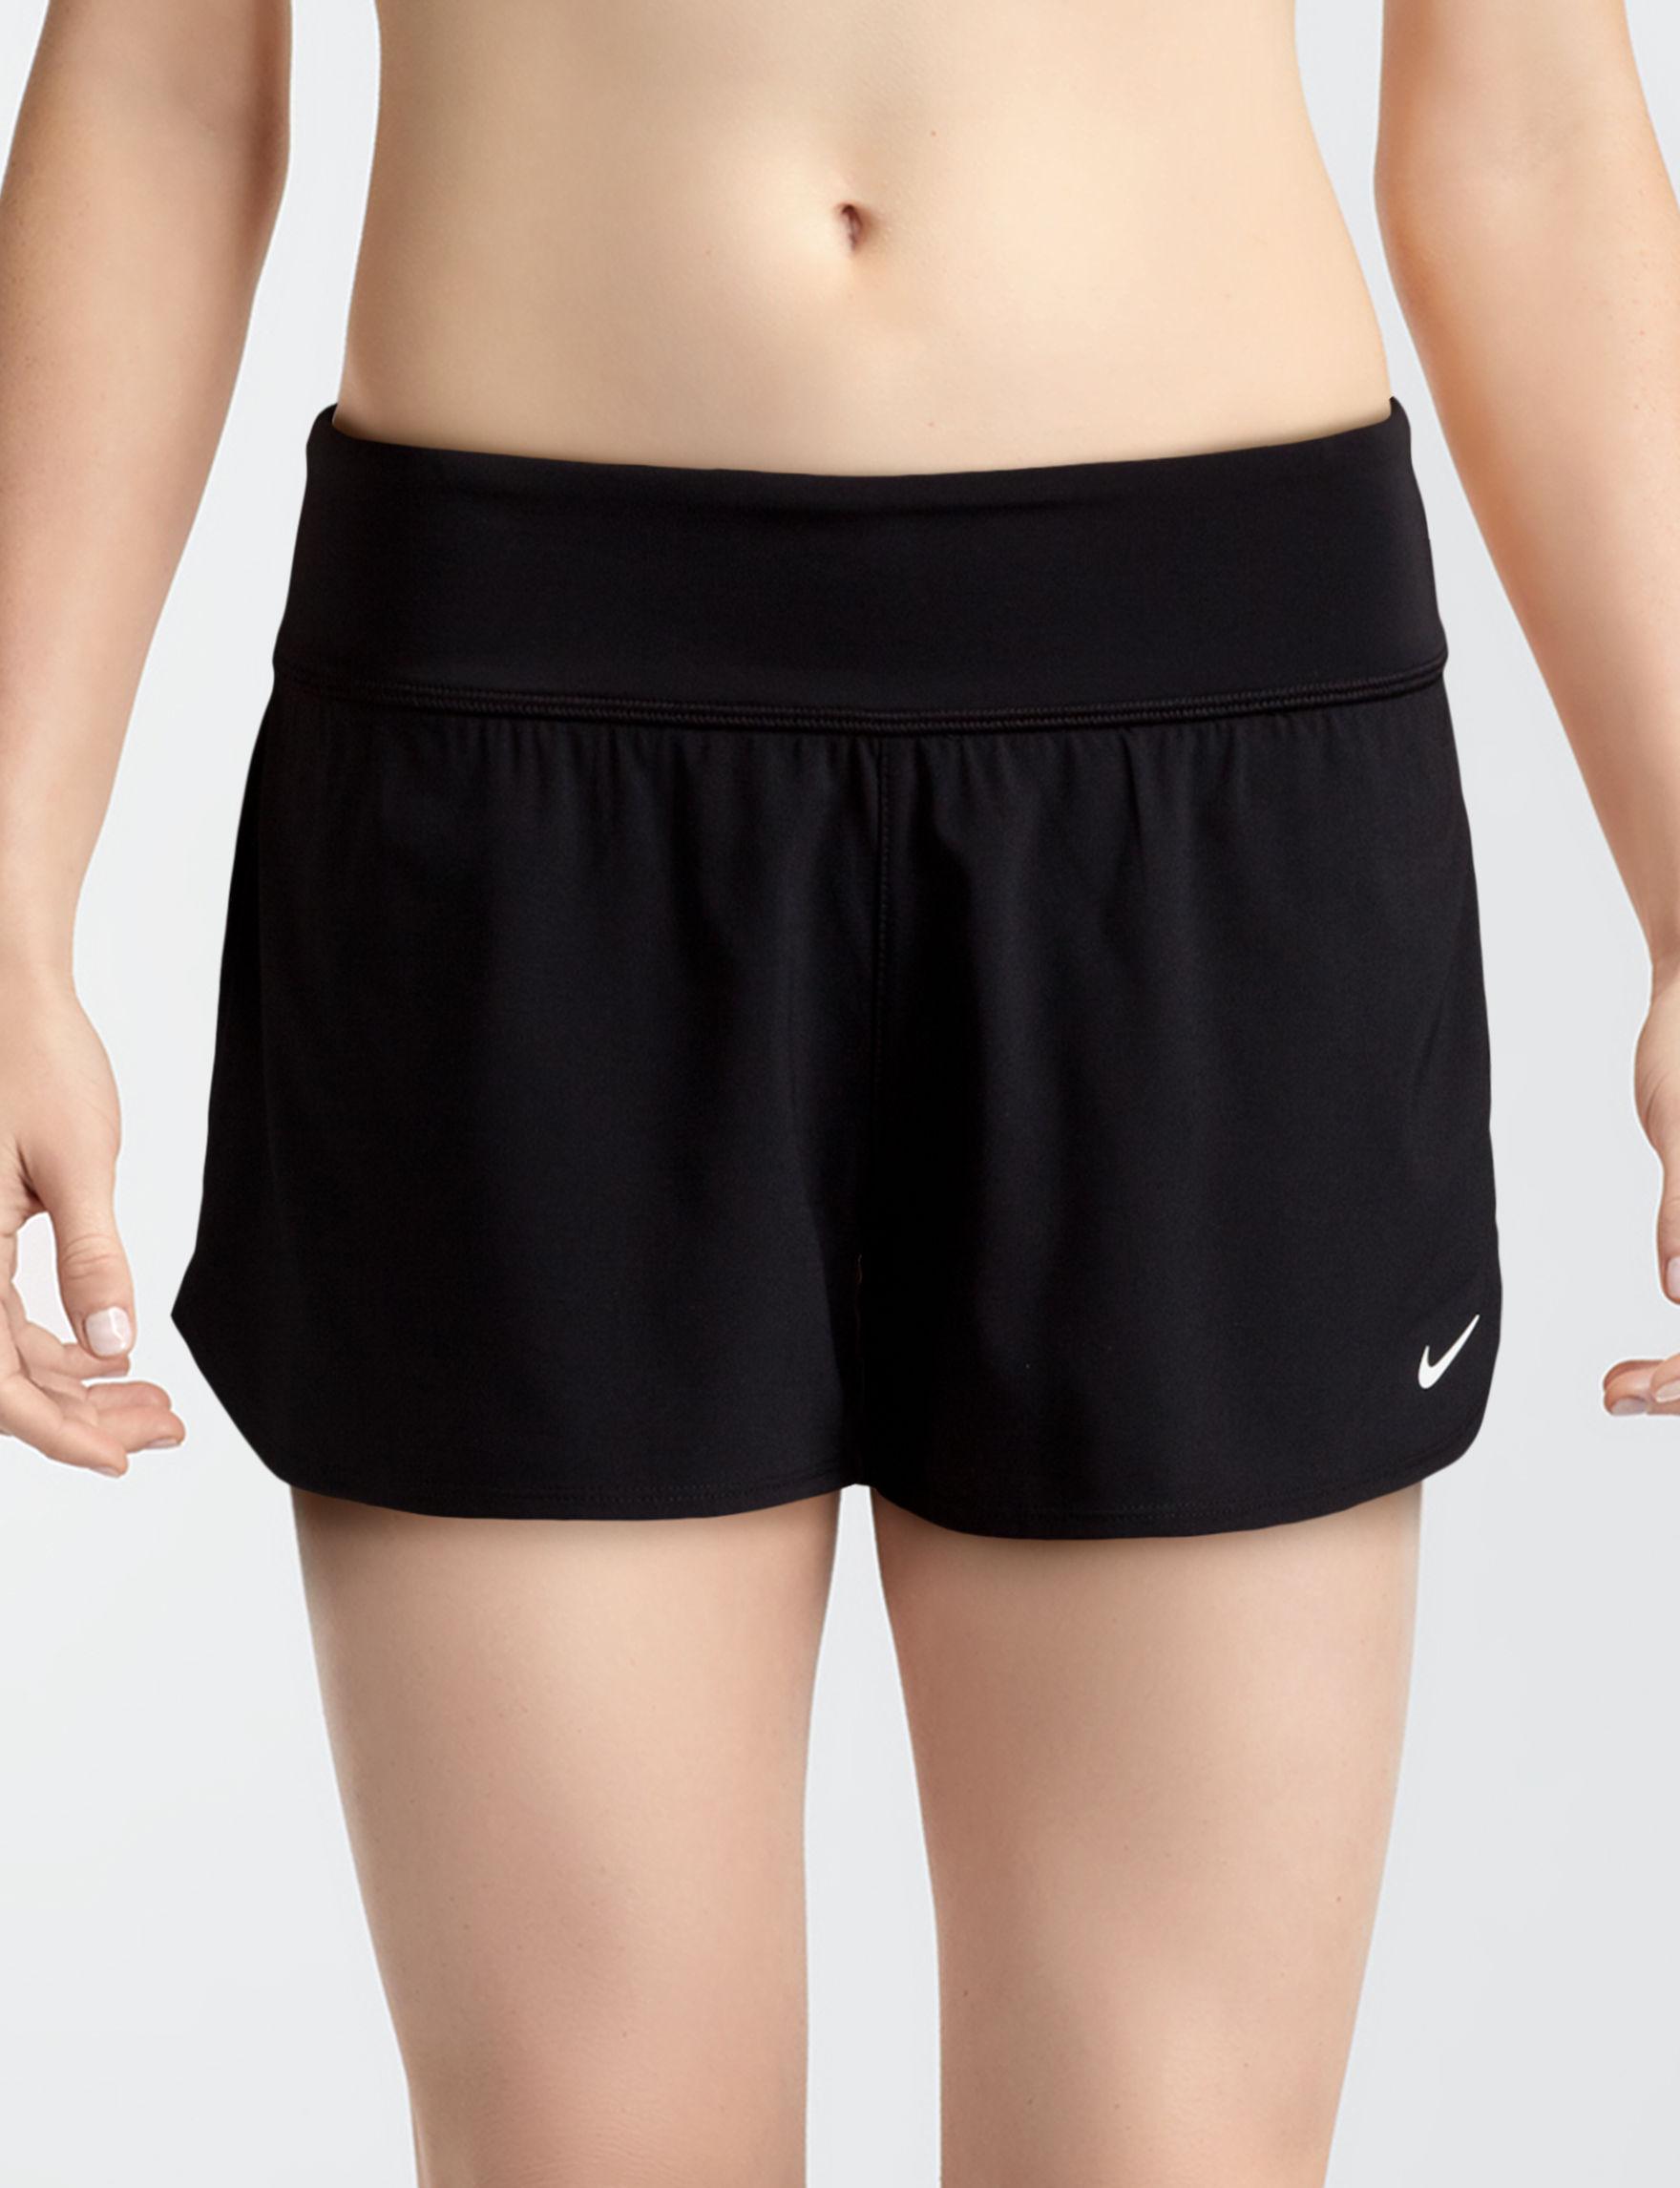 Nike Black Swimsuit Bottoms Boyshort